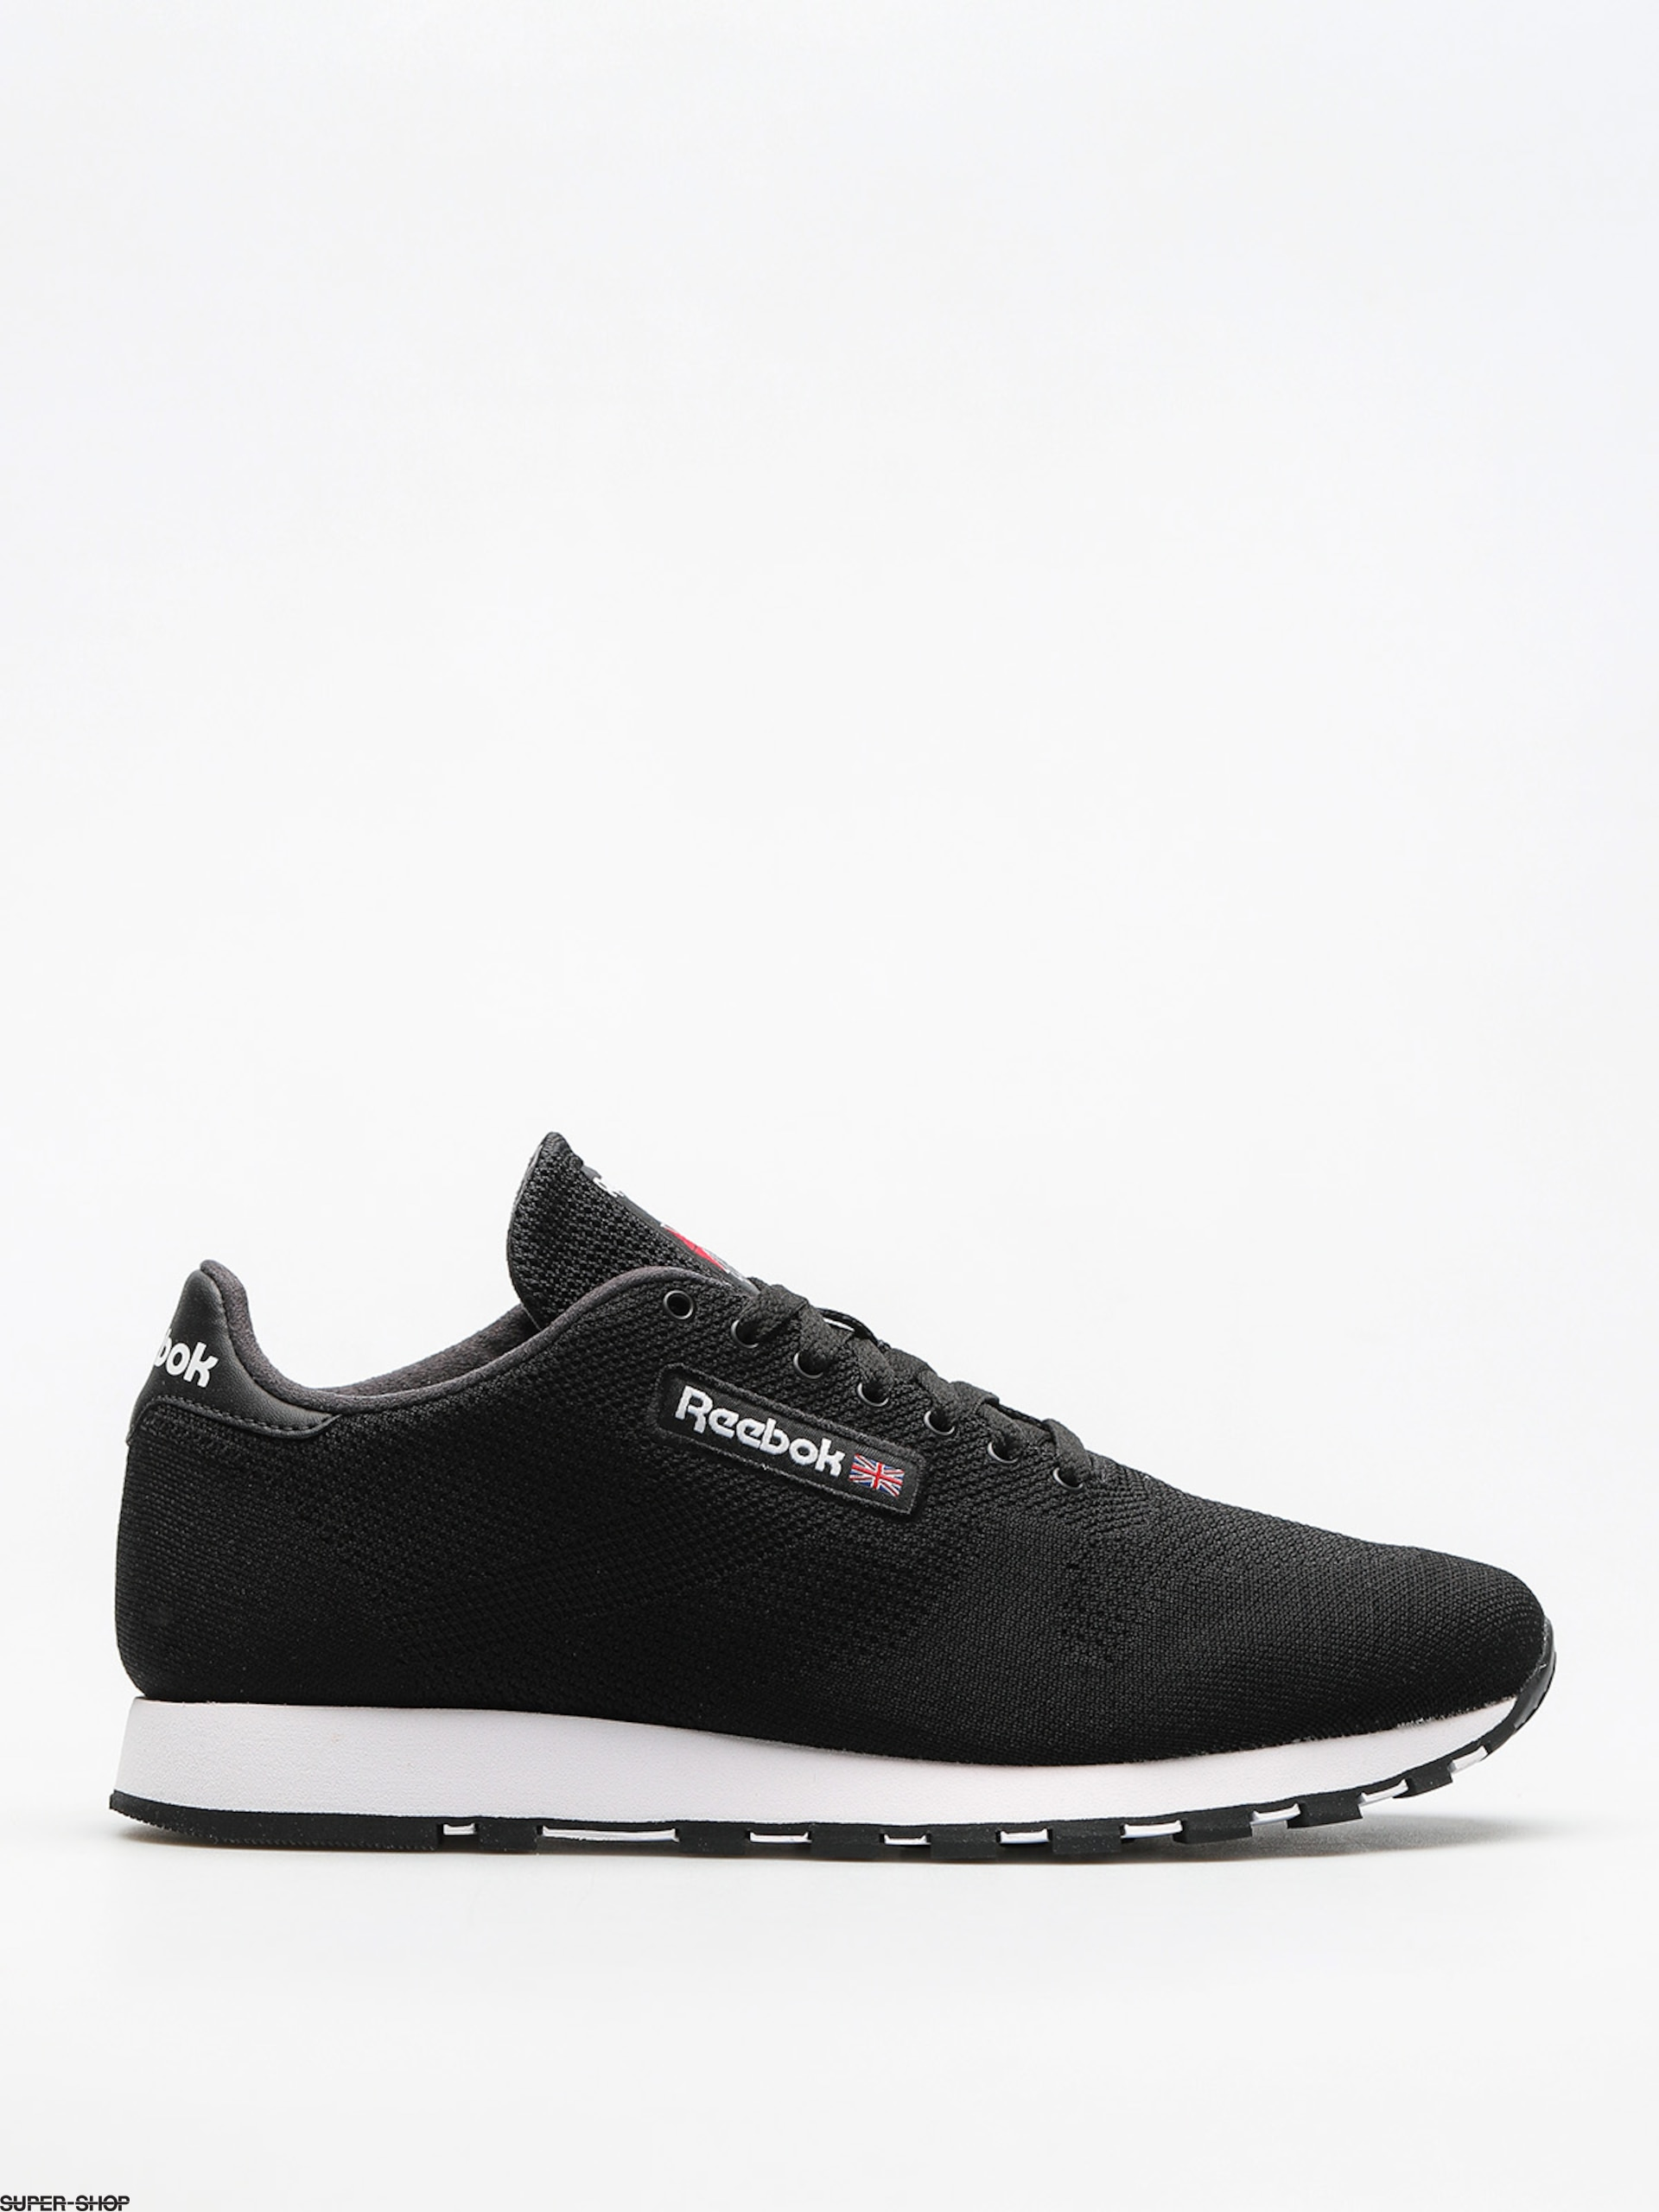 buy online 8dc17 428e7 Reebok Schuhe Cl Leather Ultk (black/white)